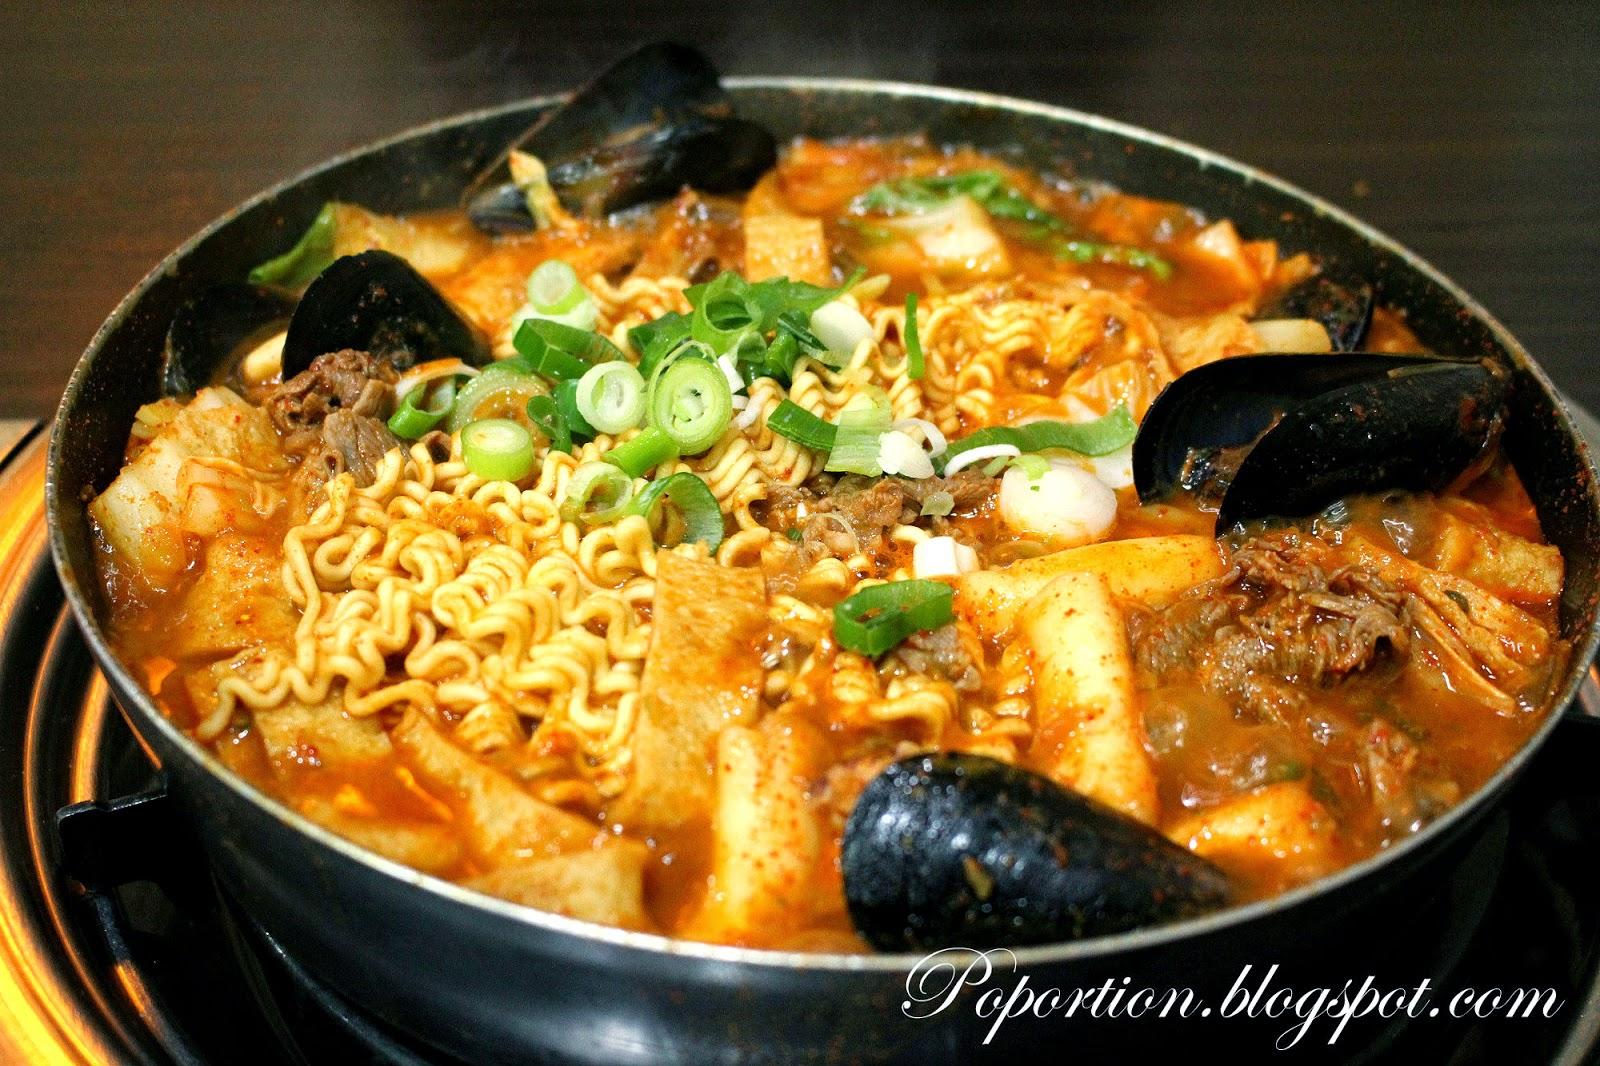 army stew ramen fish cakes topoki meat seafood